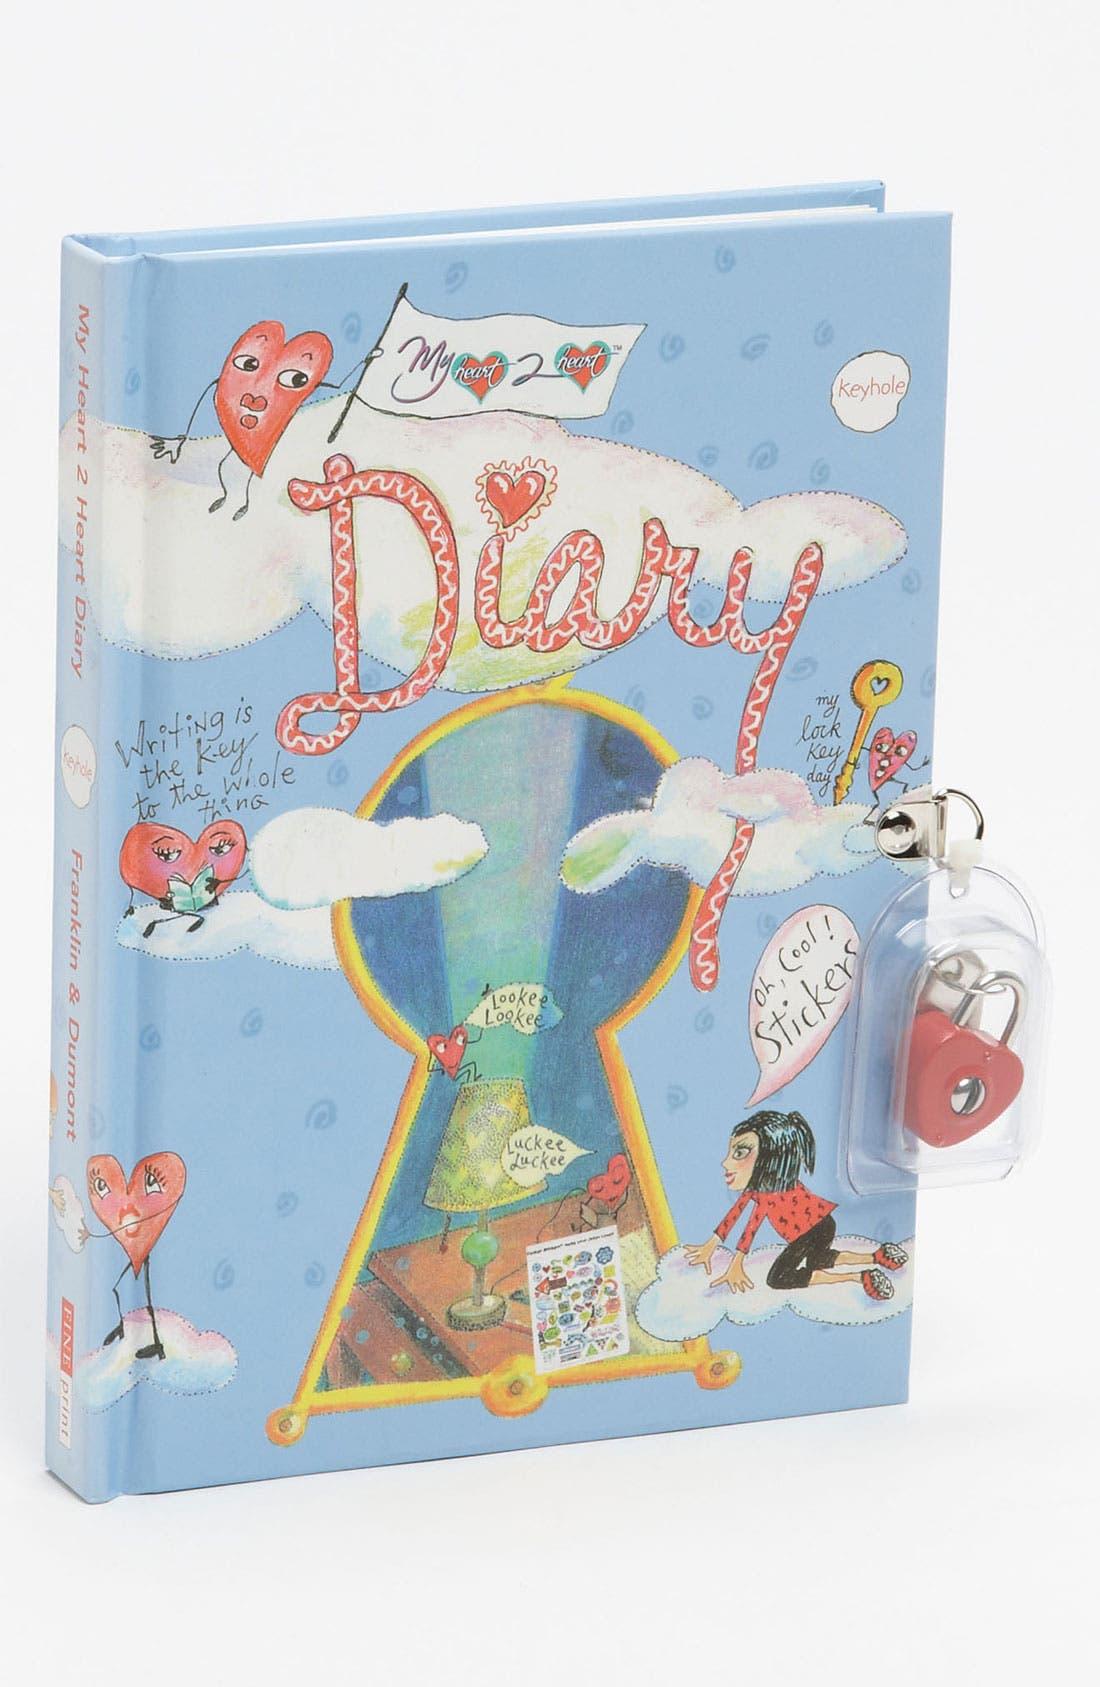 Alternate Image 1 Selected - Fine Print Publishing 'Locket' Diary (Girls)